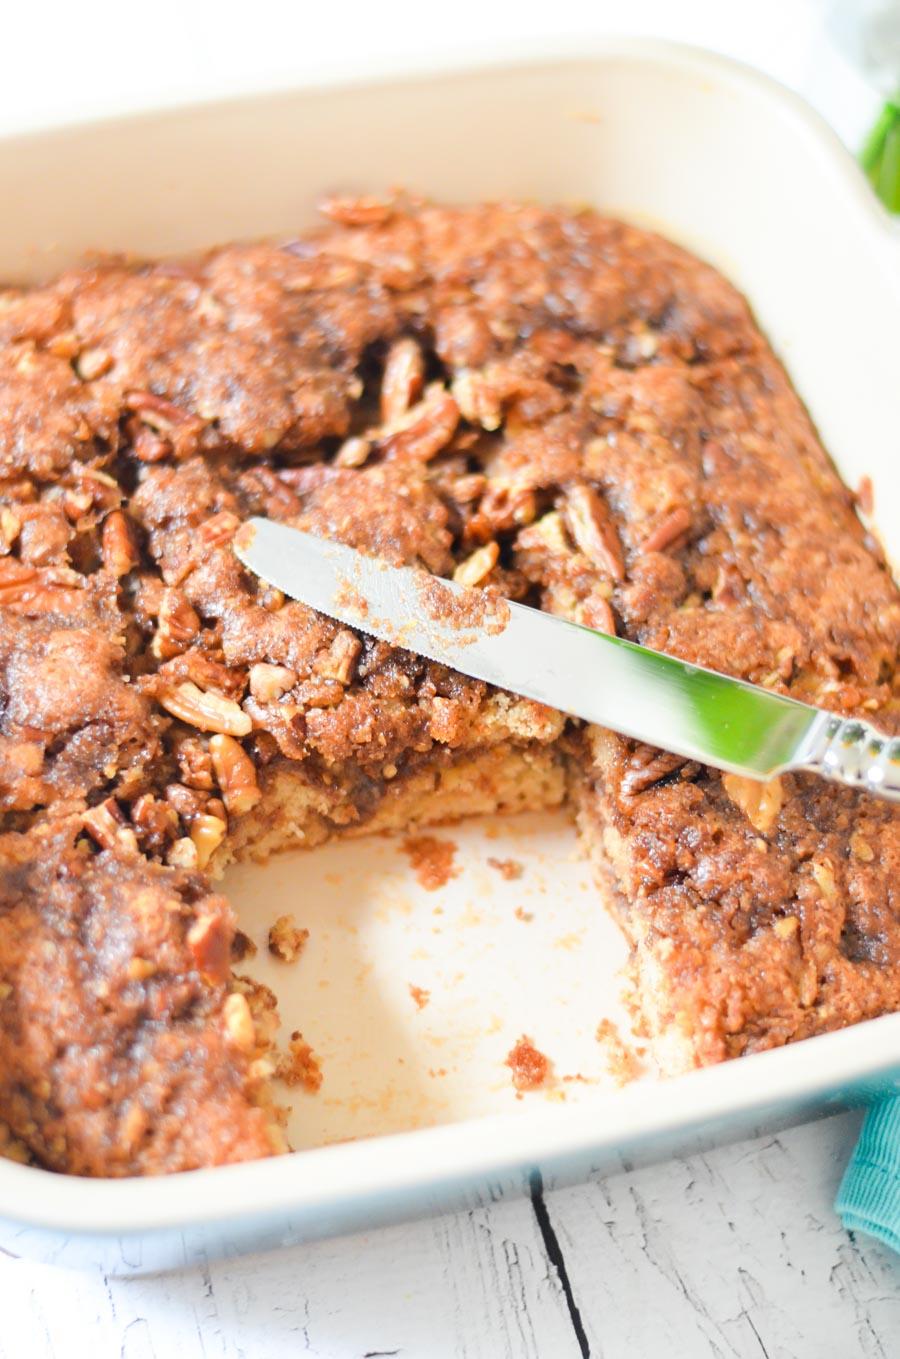 Homemade Cinnamon Coffee Cake with Streusel Crumb Topping